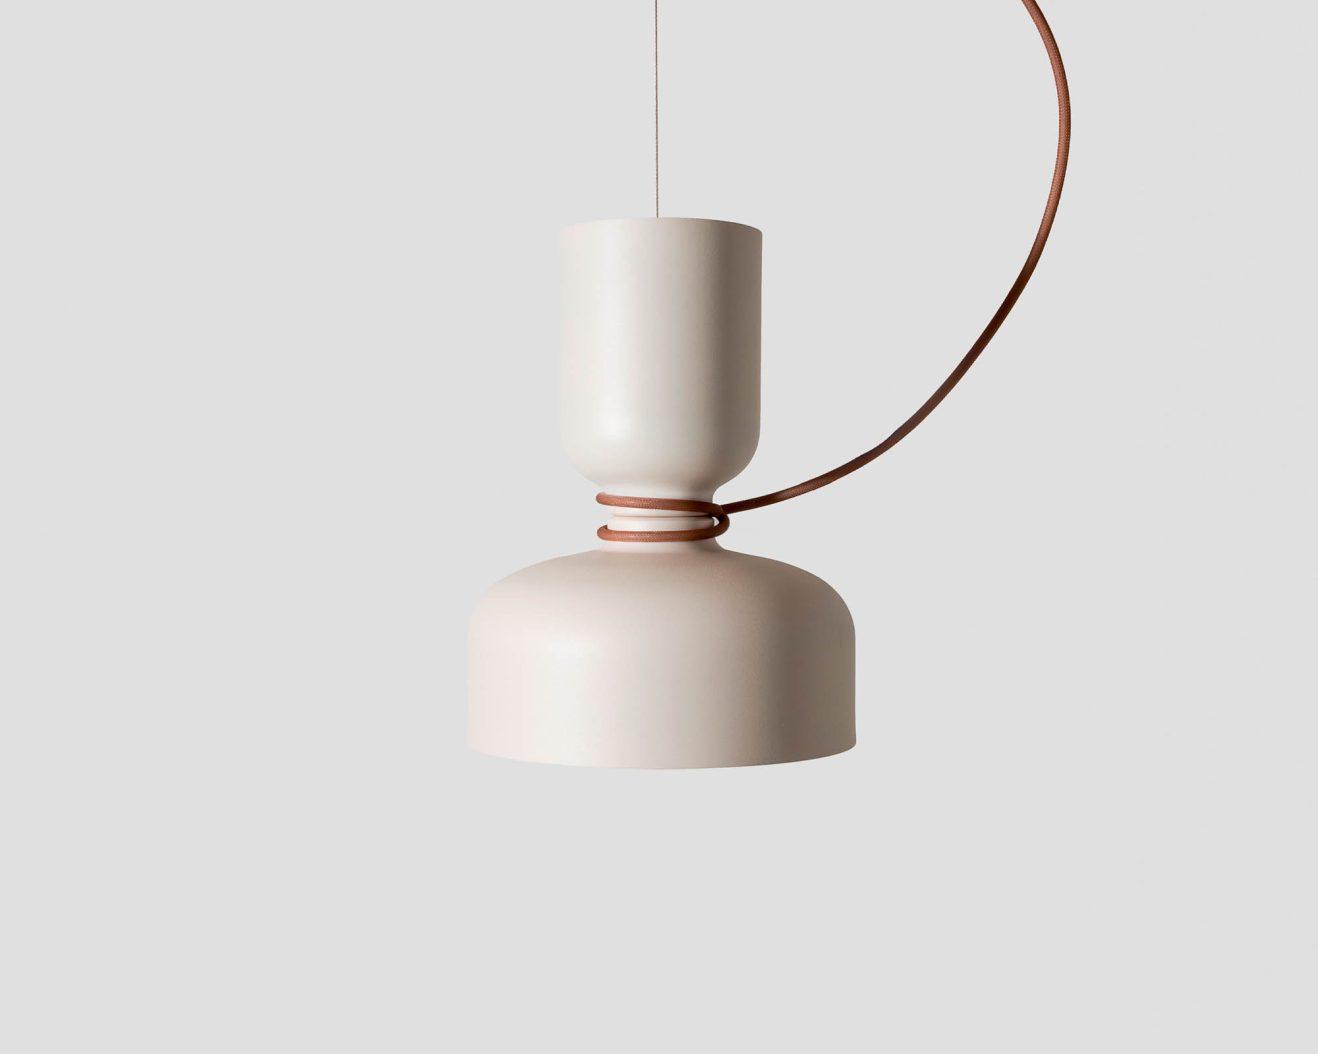 Andlight-Pendant-Lamp-AC-Vanilla-Savannah Bay Gallery